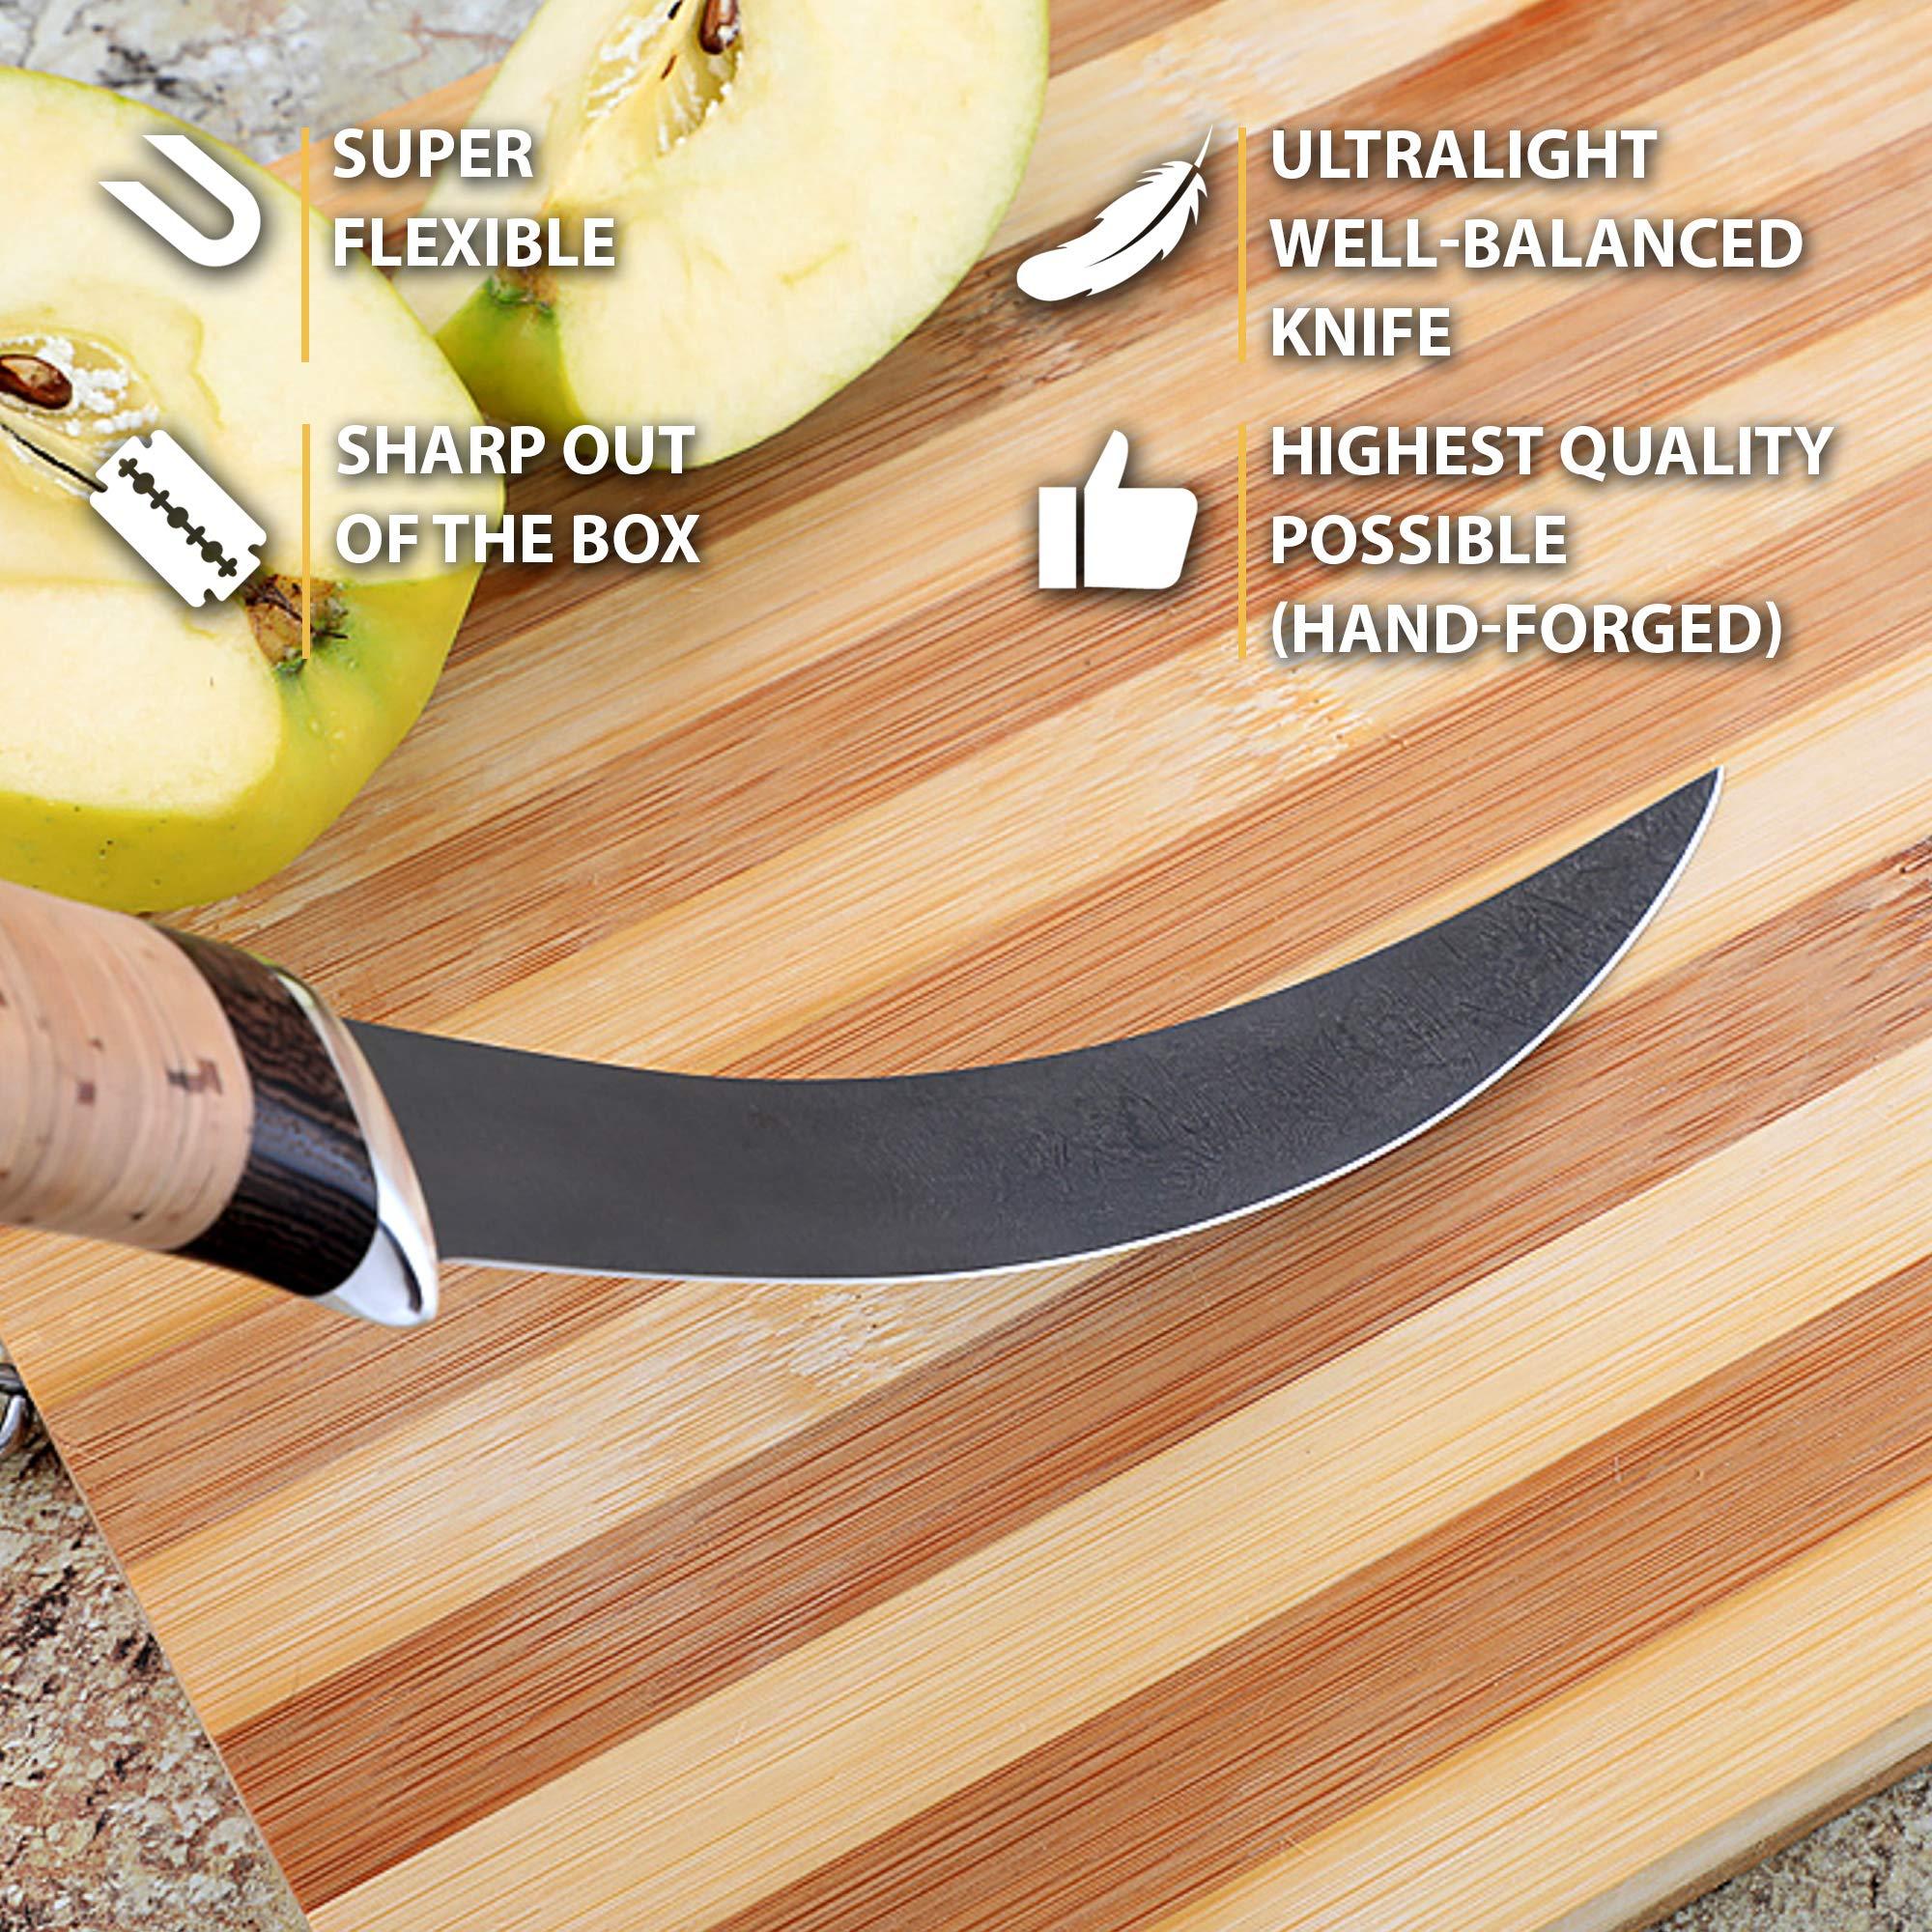 Fillet Knife - Fishing Knife - D2 Steel - Birchbark Handle - KASATKA - Leather Sheath by Nazarov Knives (Image #2)